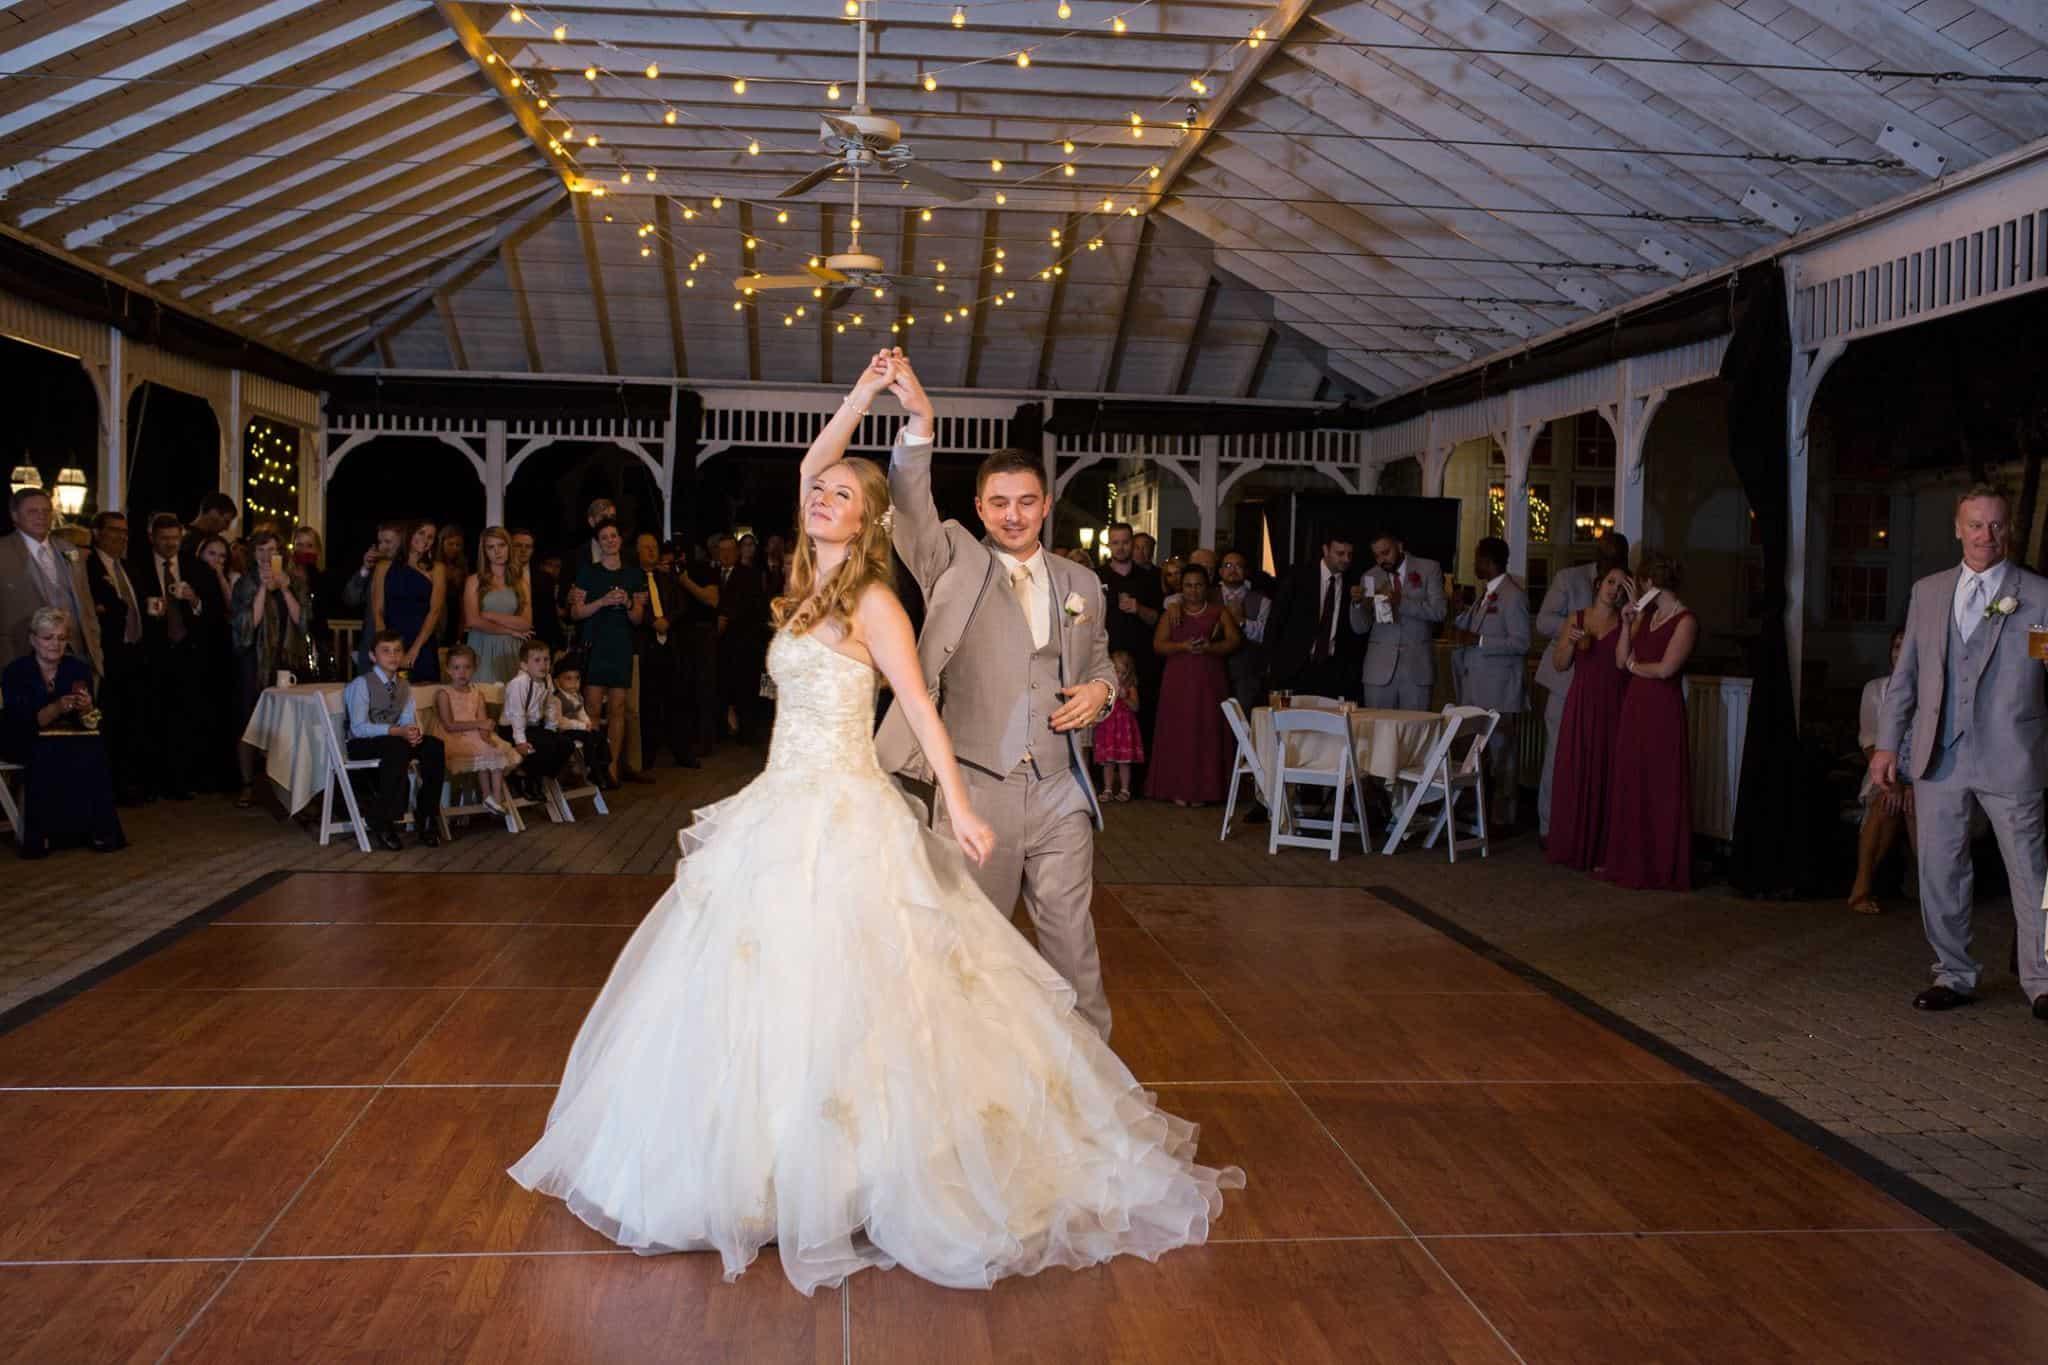 Young Couples Wedding Dance Photo